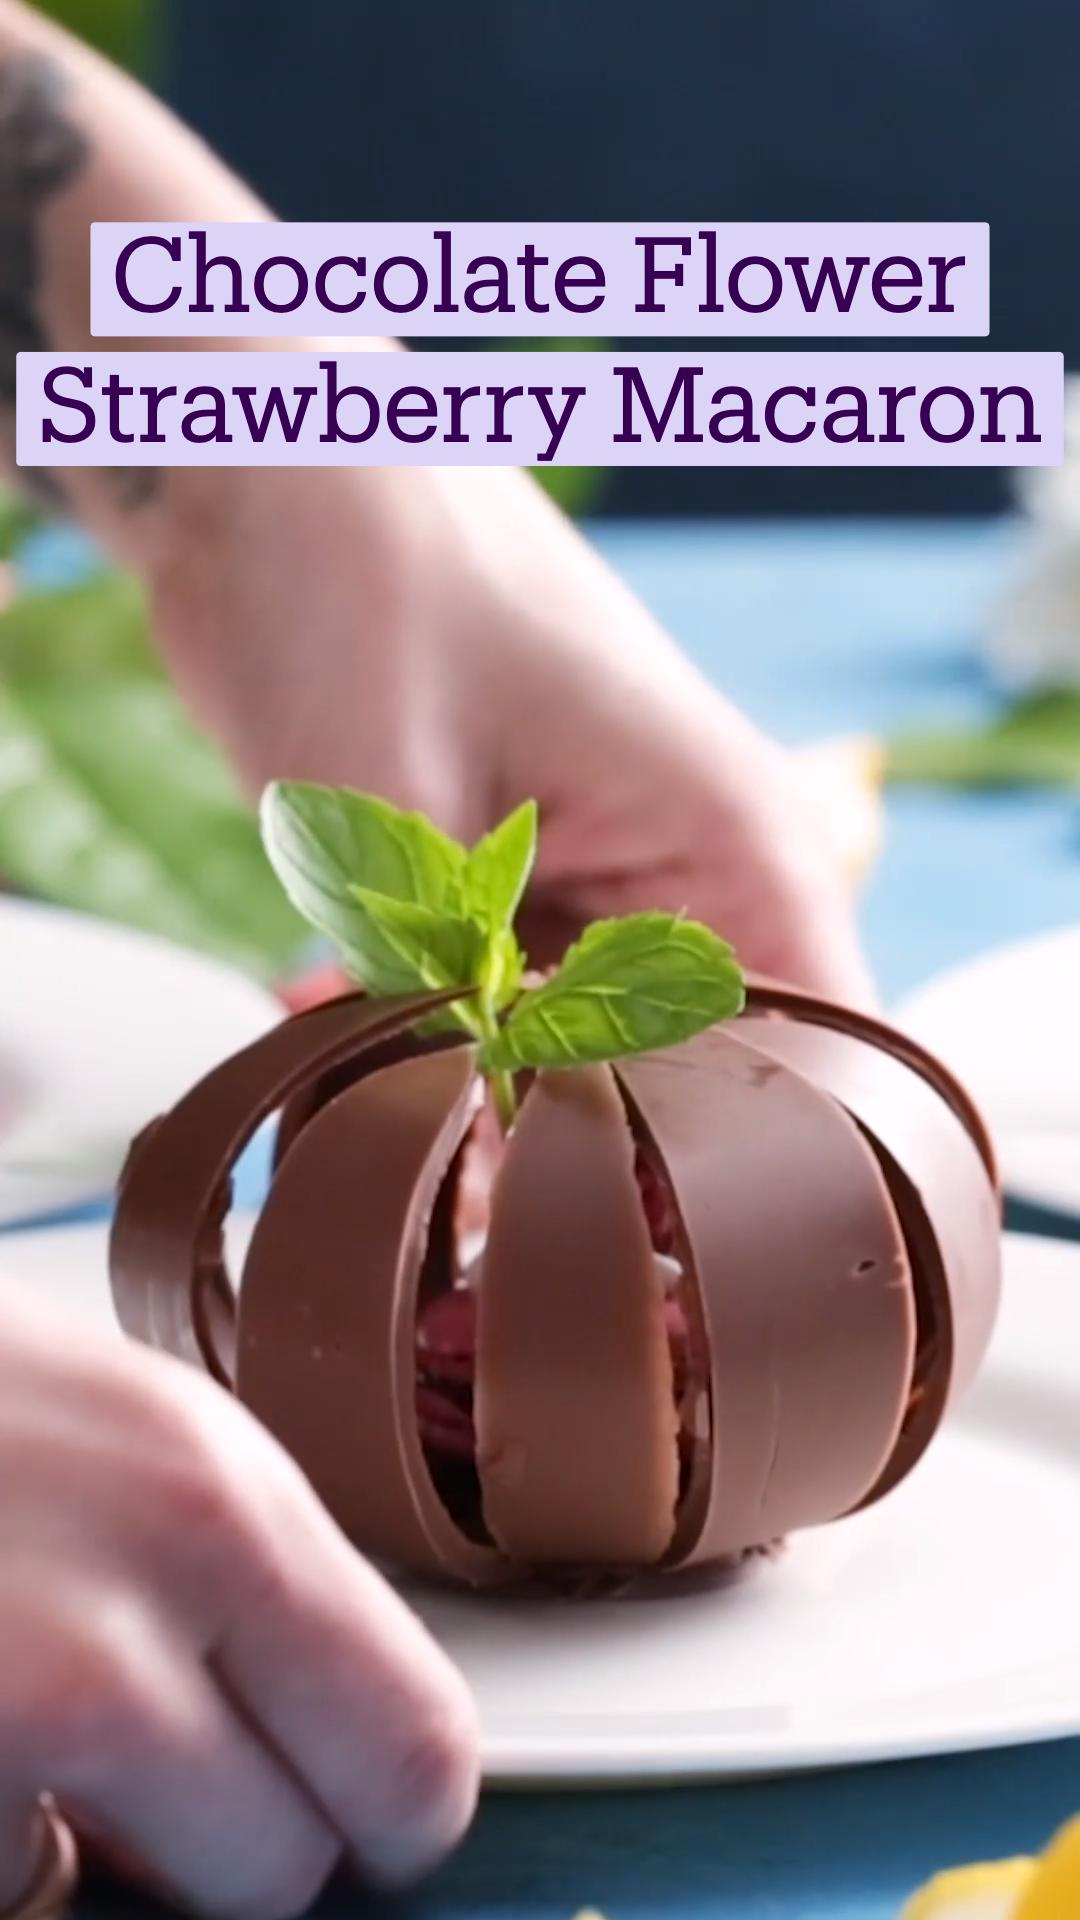 Chocolate Flower Strawberry Macaron